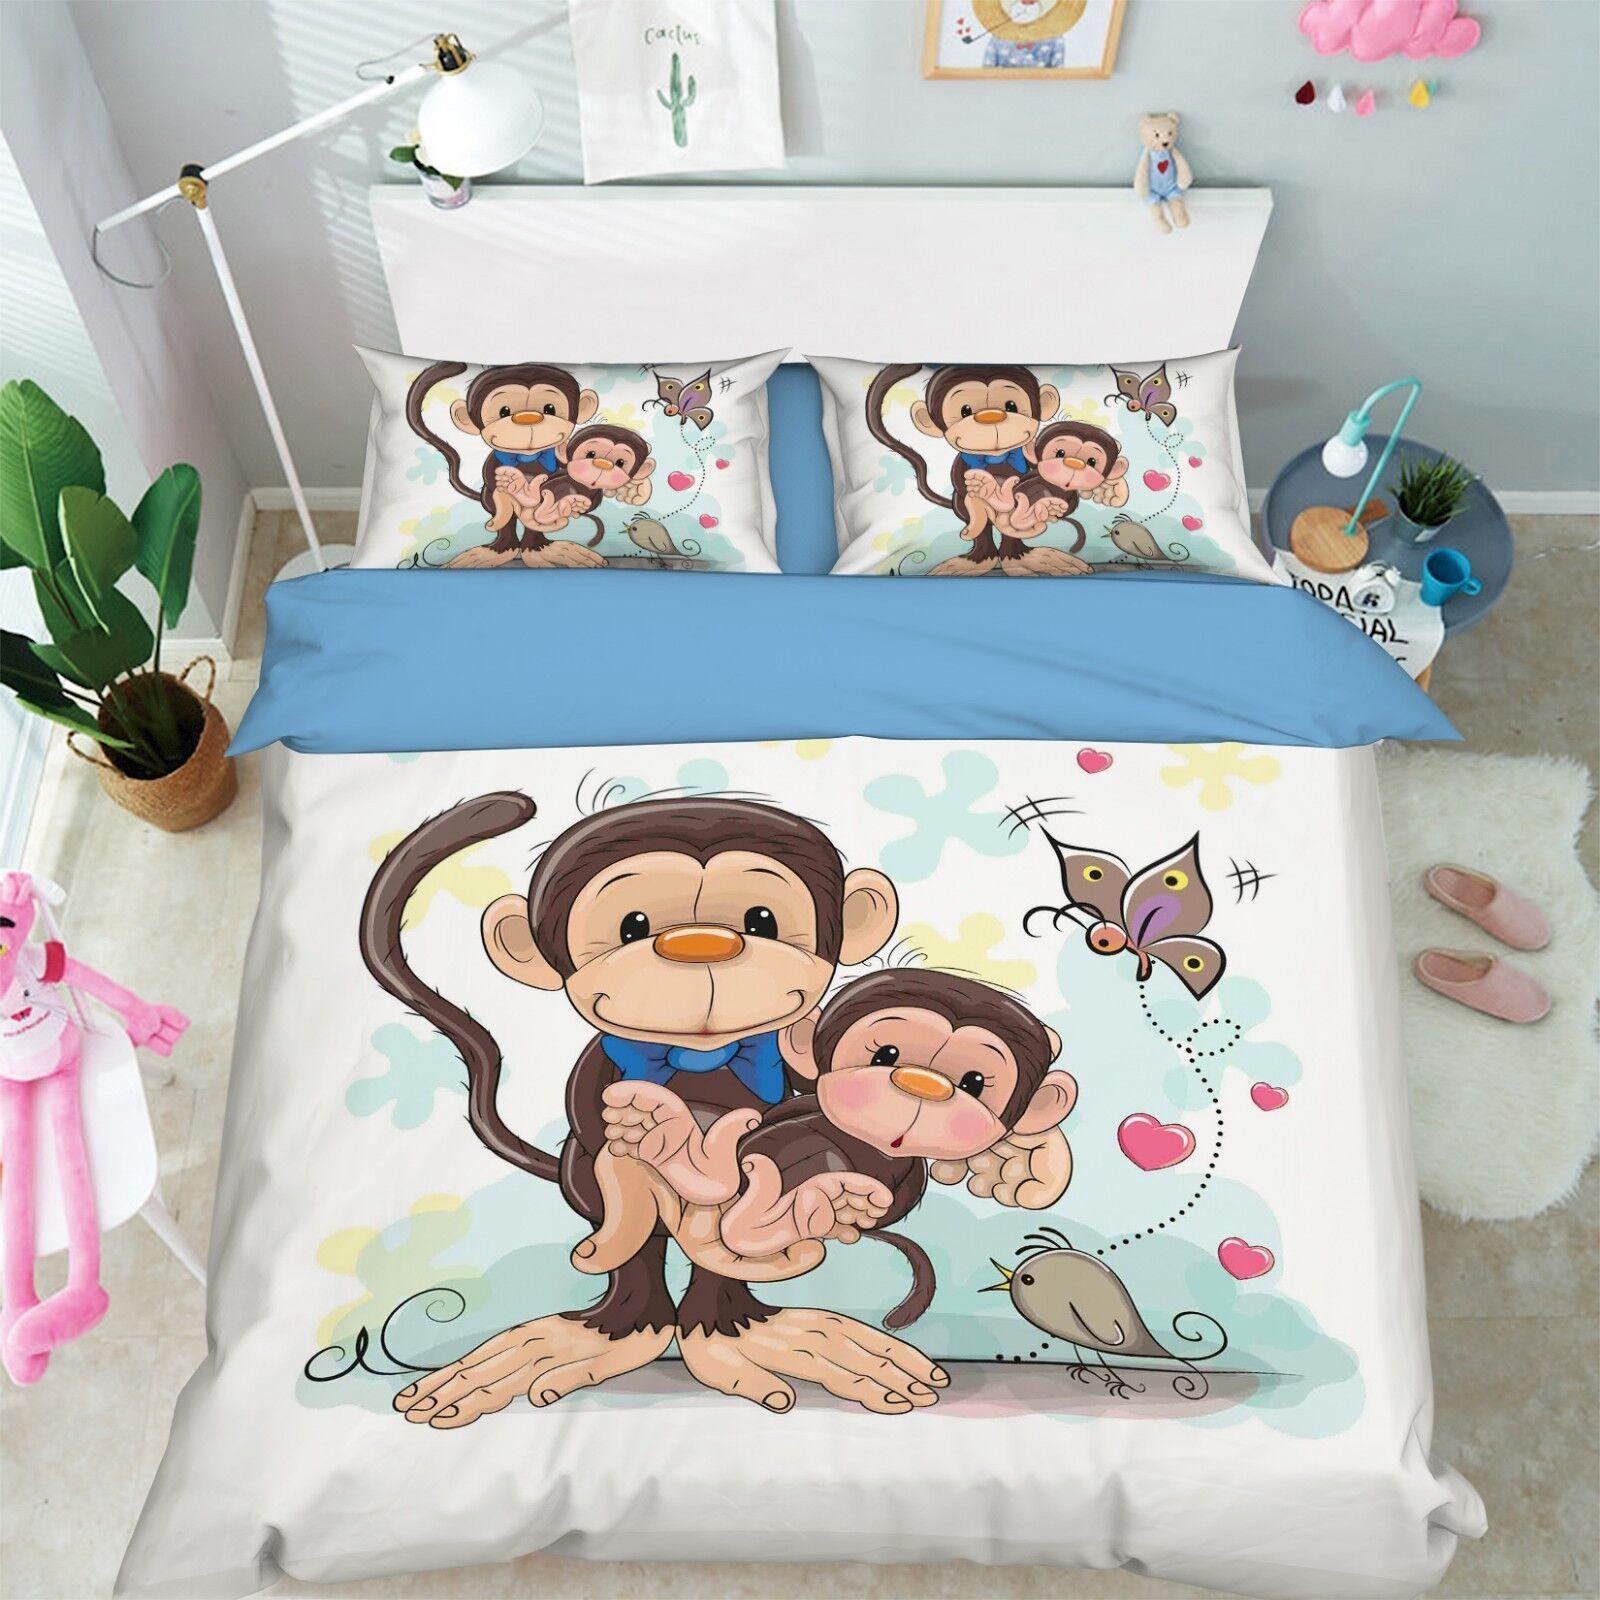 3D Cartoon Monkey 779 Bed Pillowcases Quilt Duvet Cover Set Single Queen King CA